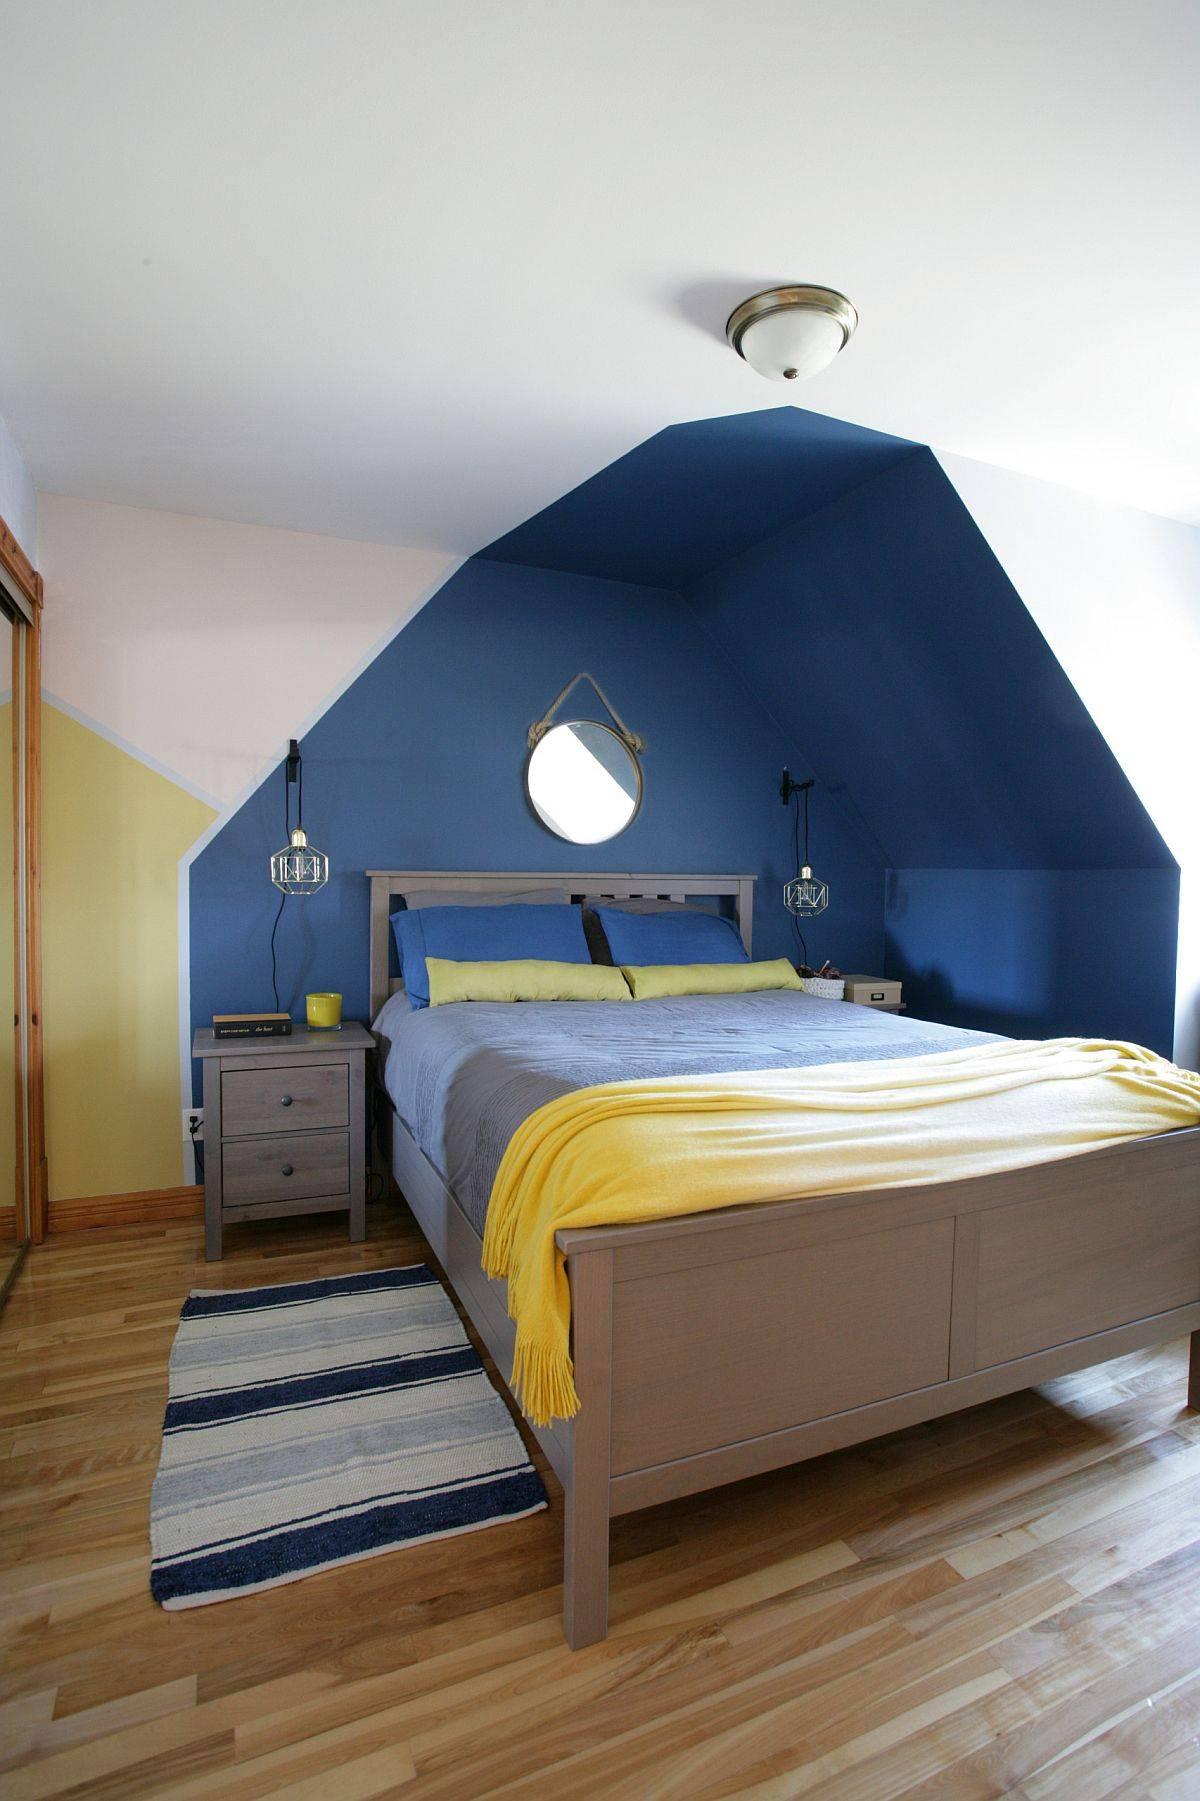 Ingenious-Scandinavian-style-bedroom-in-blue-and-yellow-52580